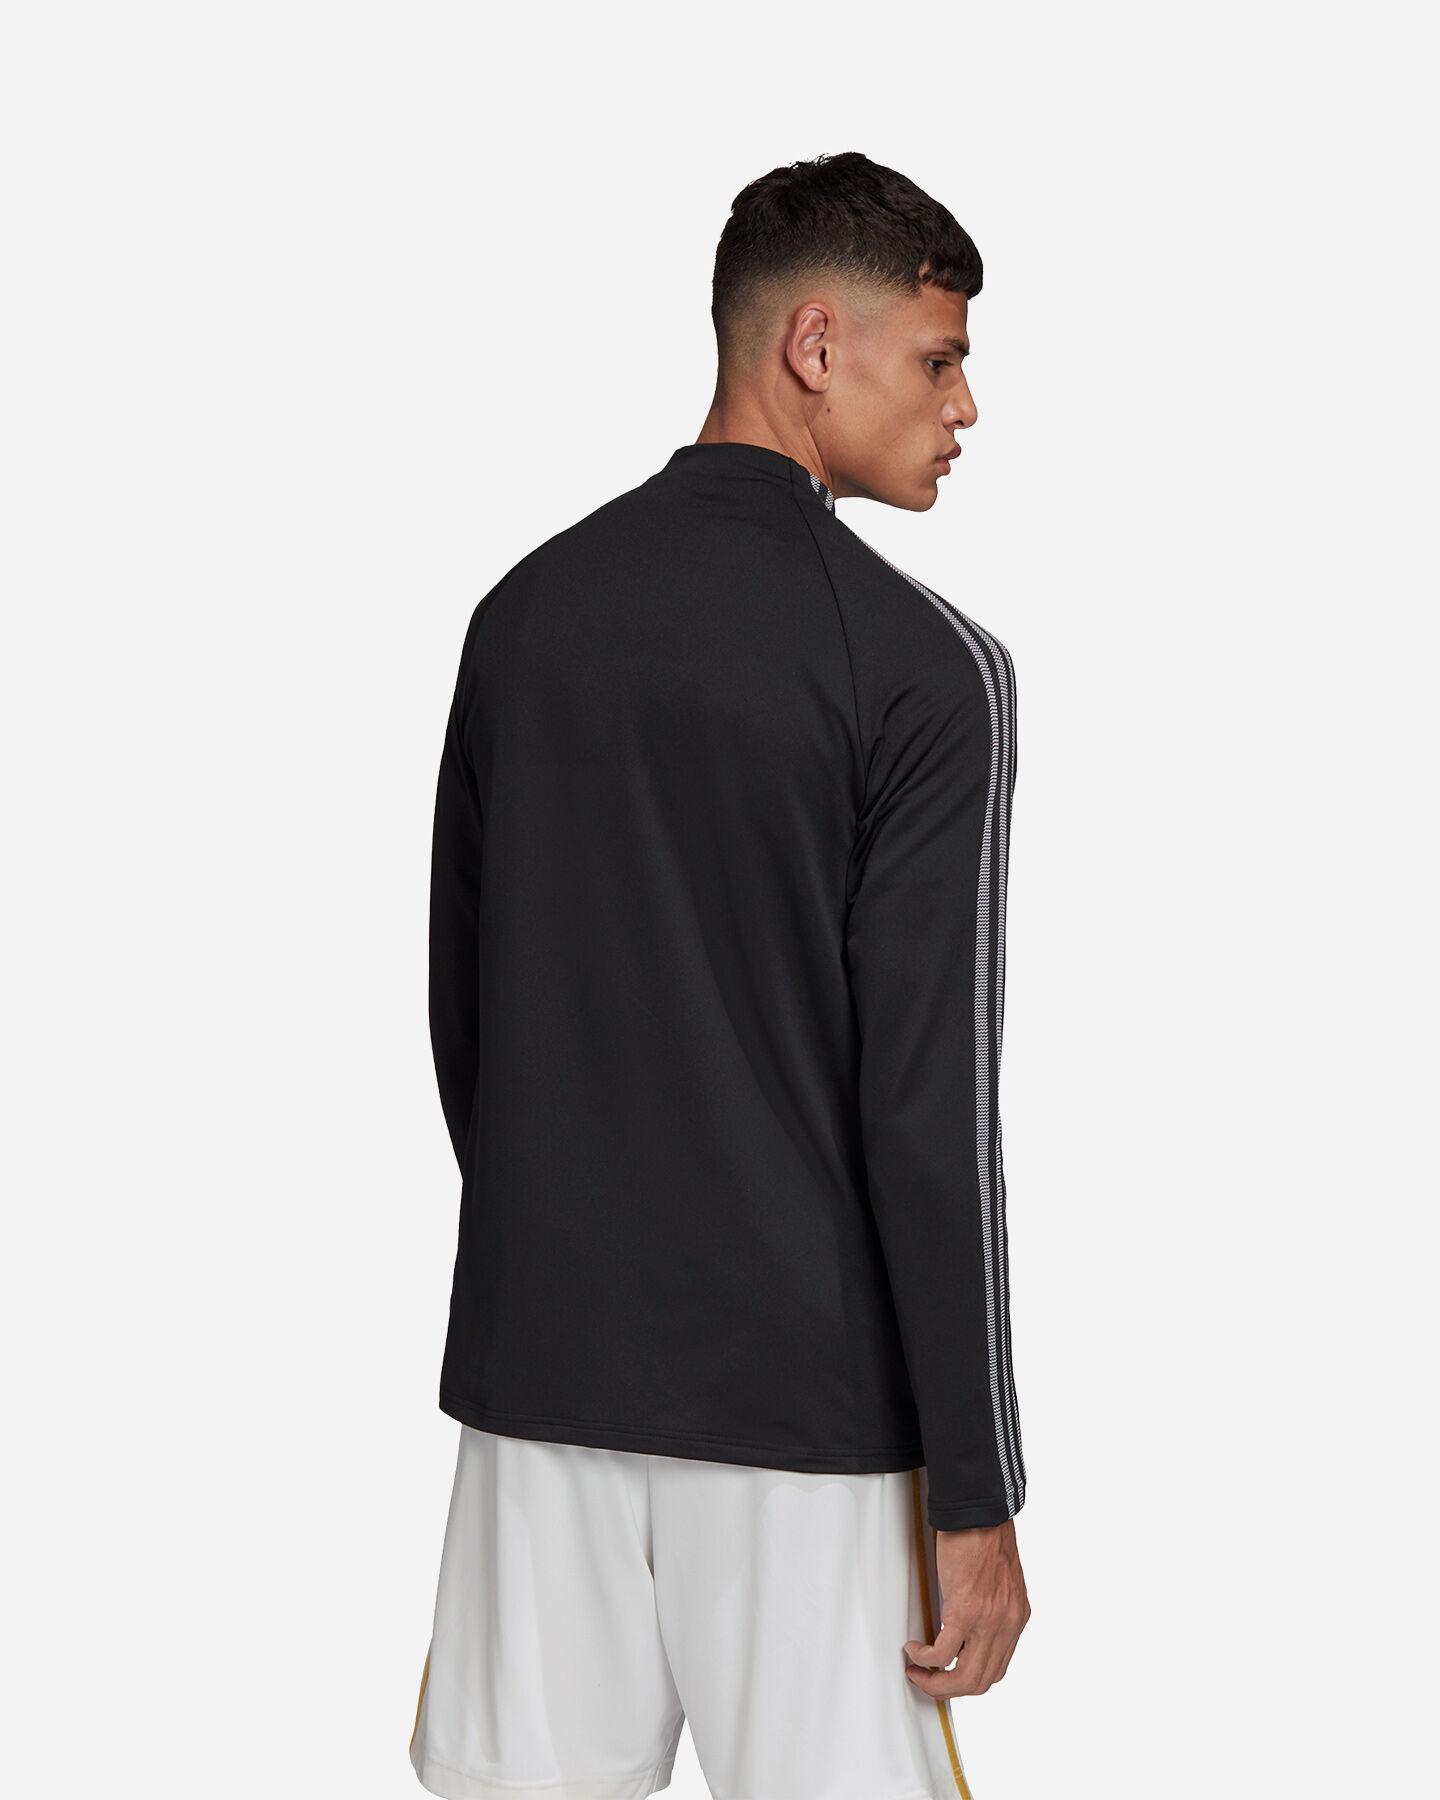 Abbigliamento calcio ADIDAS JUVENTUS ANTHEM M S5153992 scatto 4